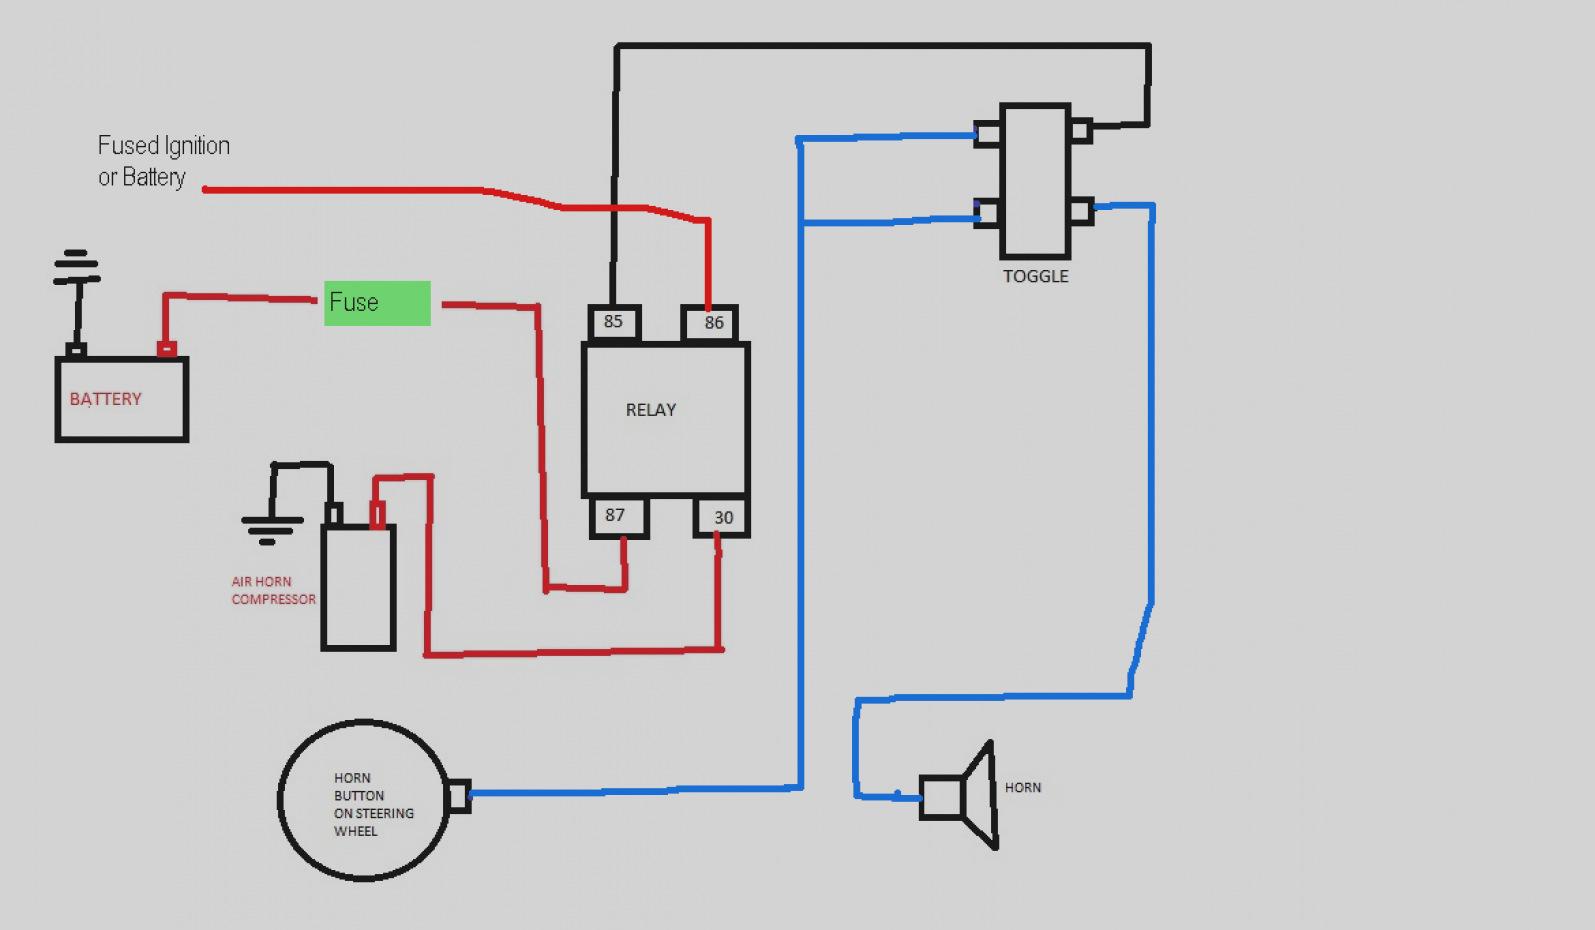 Car Air Horn Wiring Diagram Best Of Relay Inside - Hbphelp - Air Horns Wiring Diagram